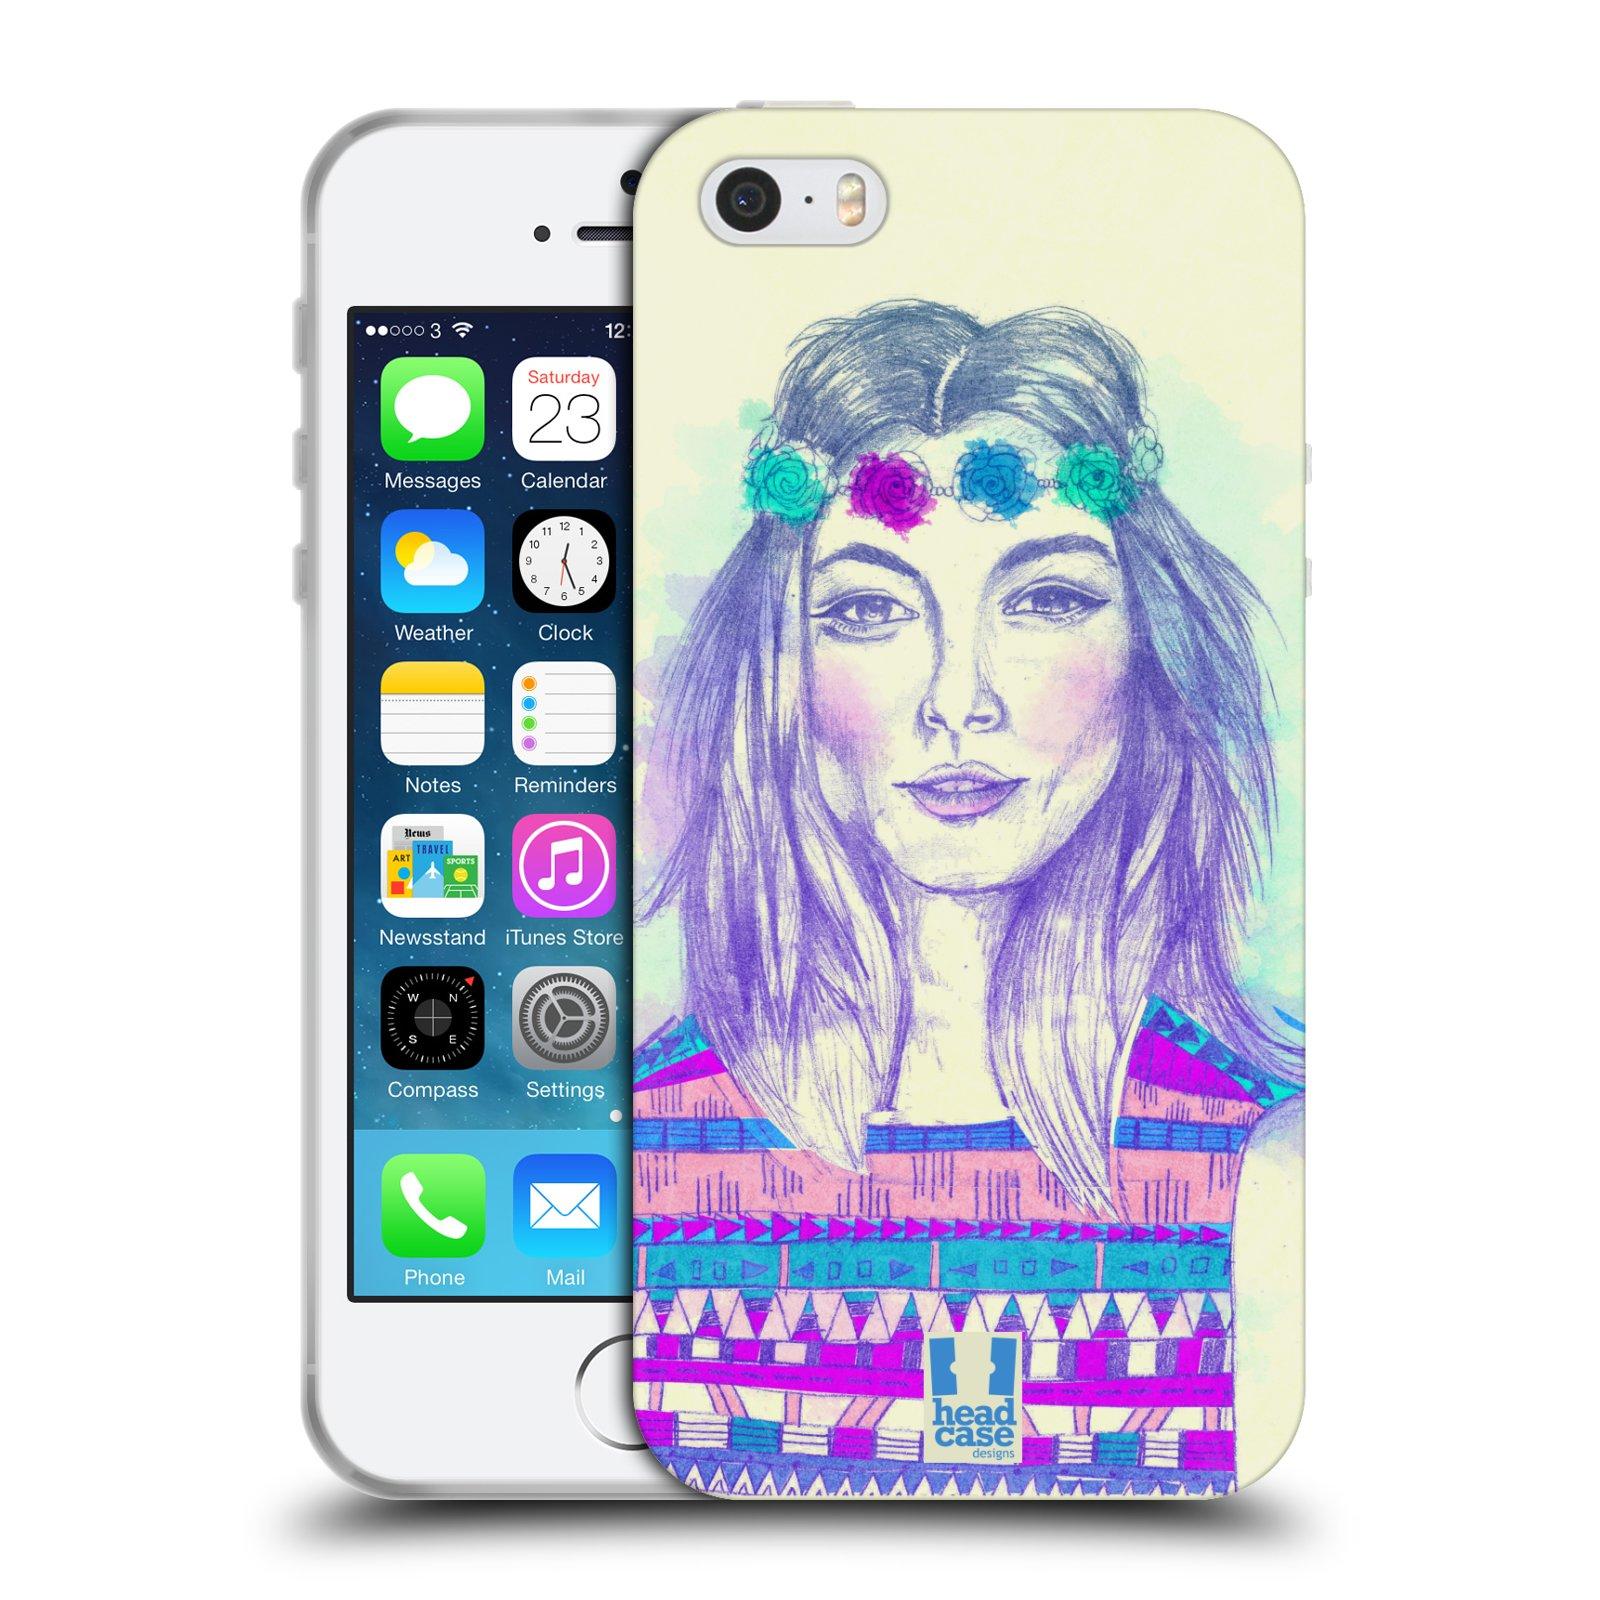 HEAD CASE silikonový obal na mobil Apple Iphone 5/5S vzor Dívka dlouhé květinové vlasy HIPPIE modrá